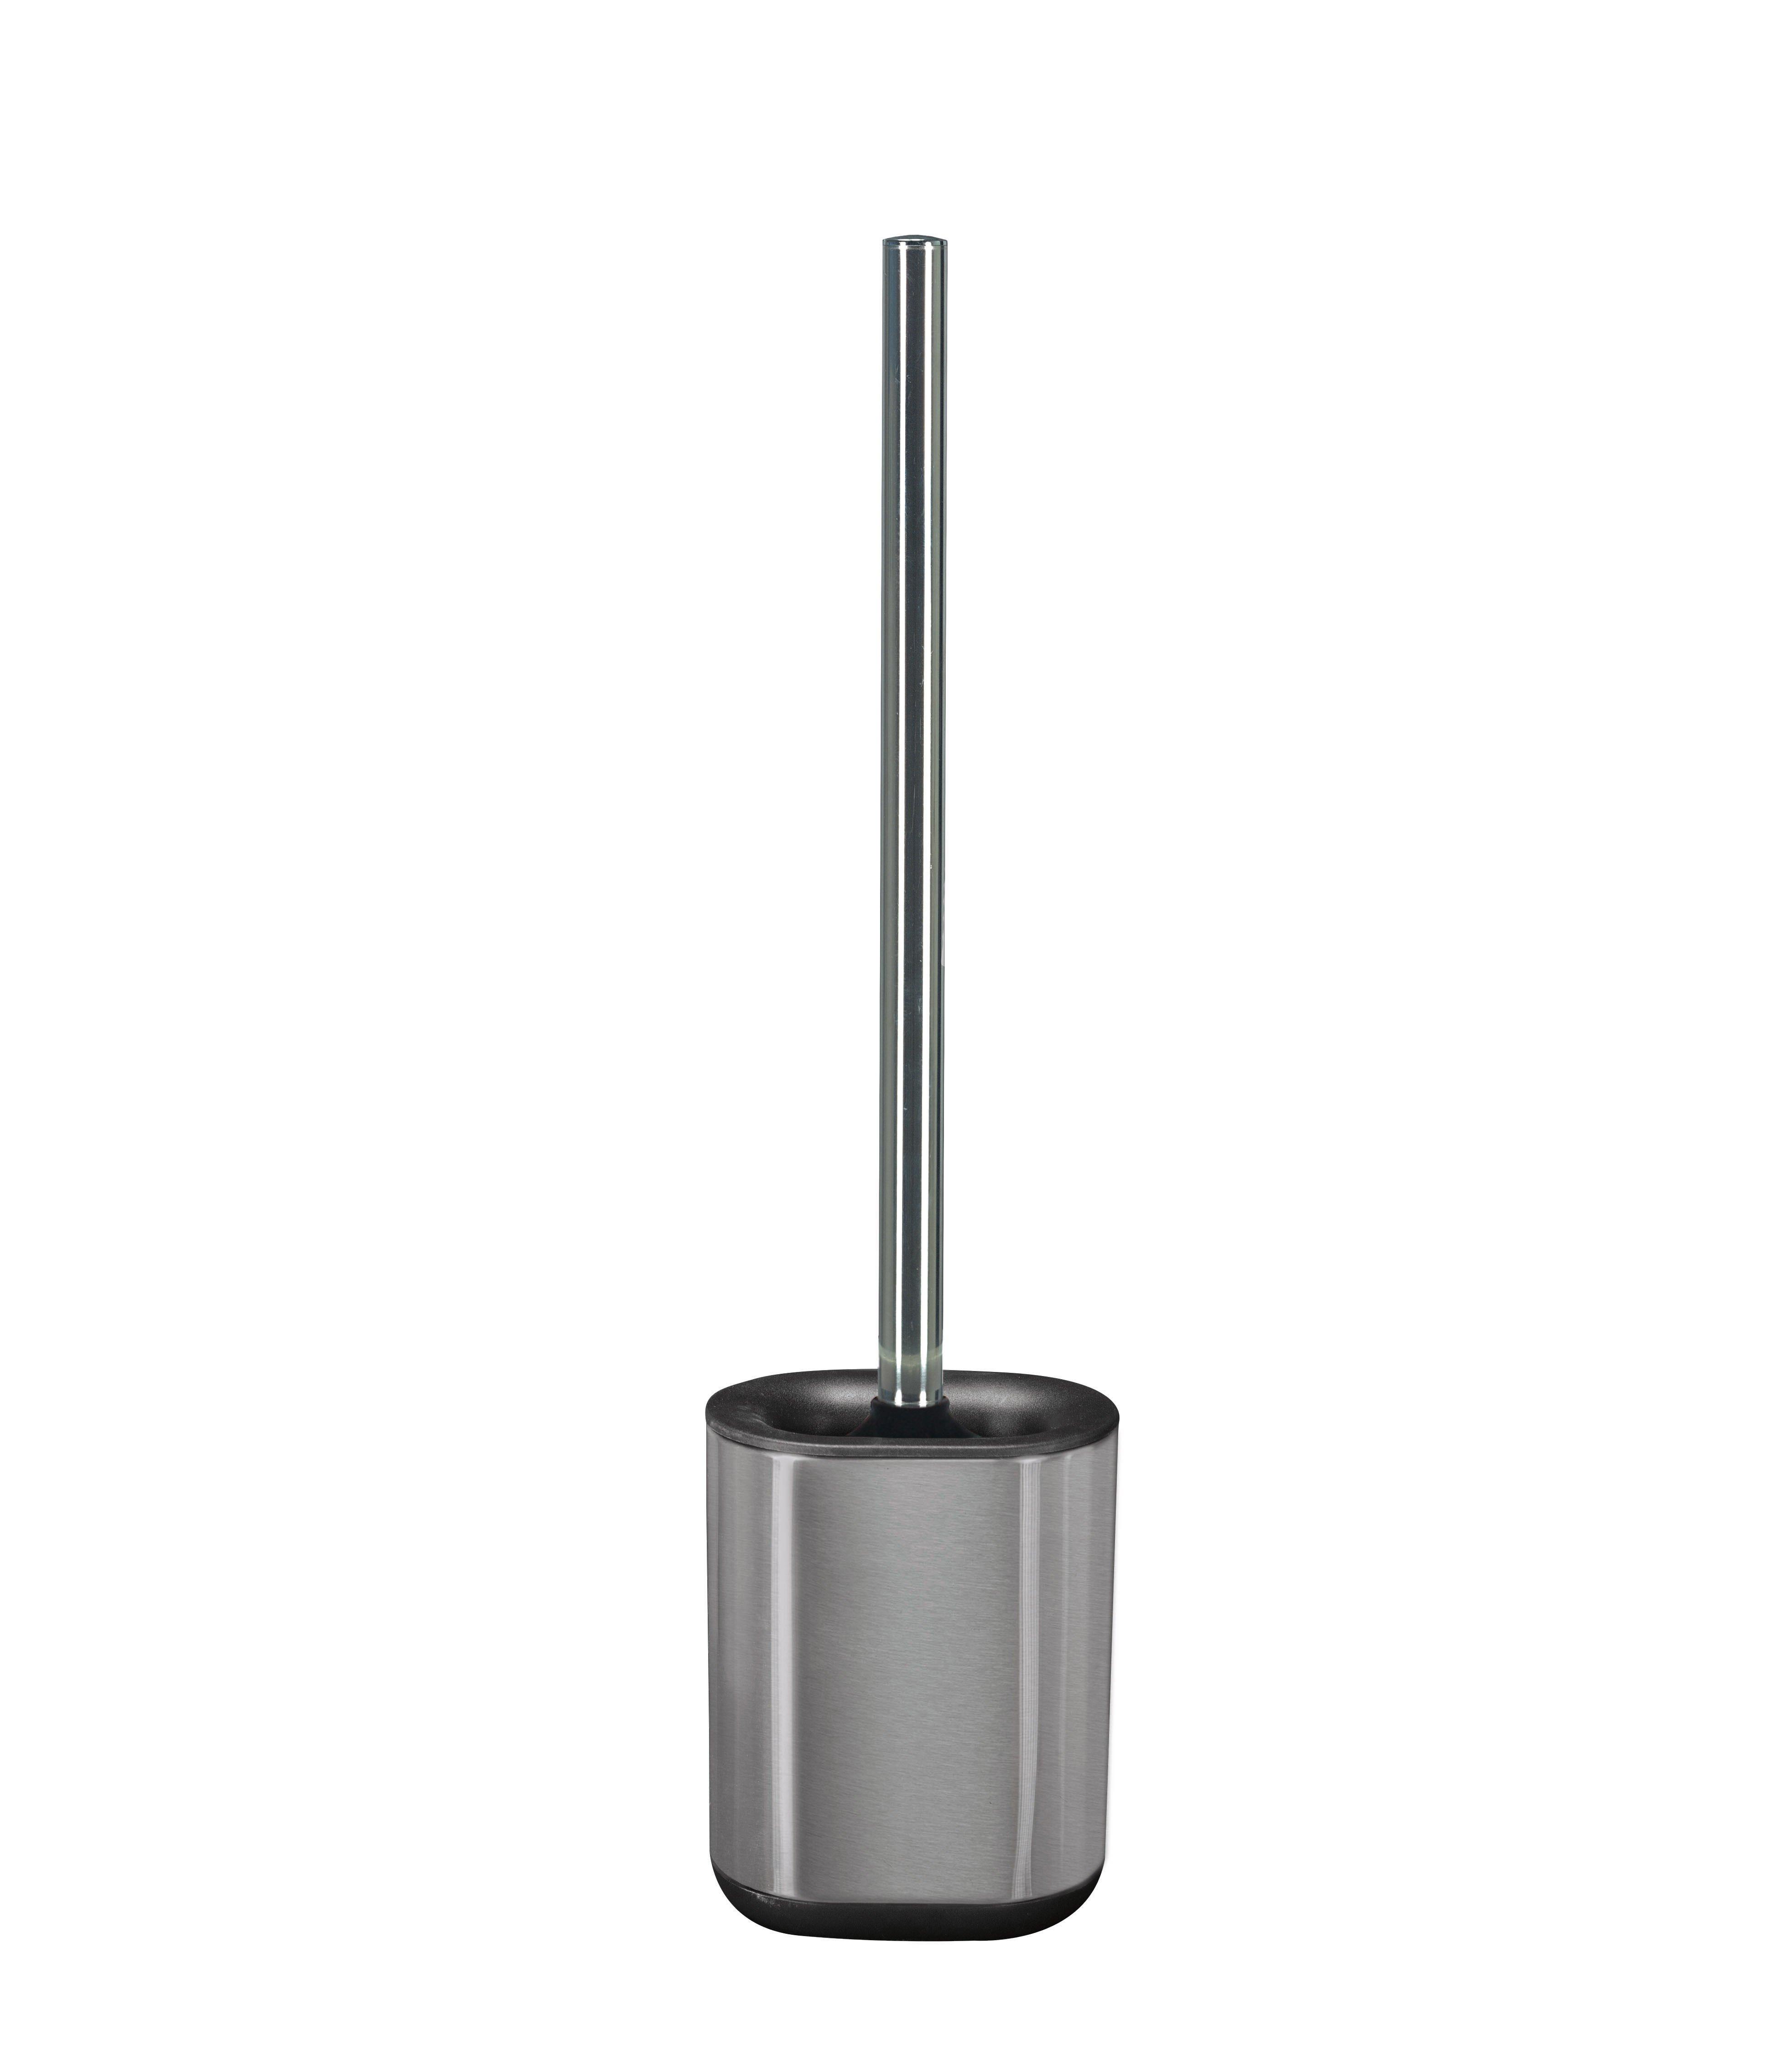 WC-Bürstenhalter Stream Chromfarbig B:11,5cm